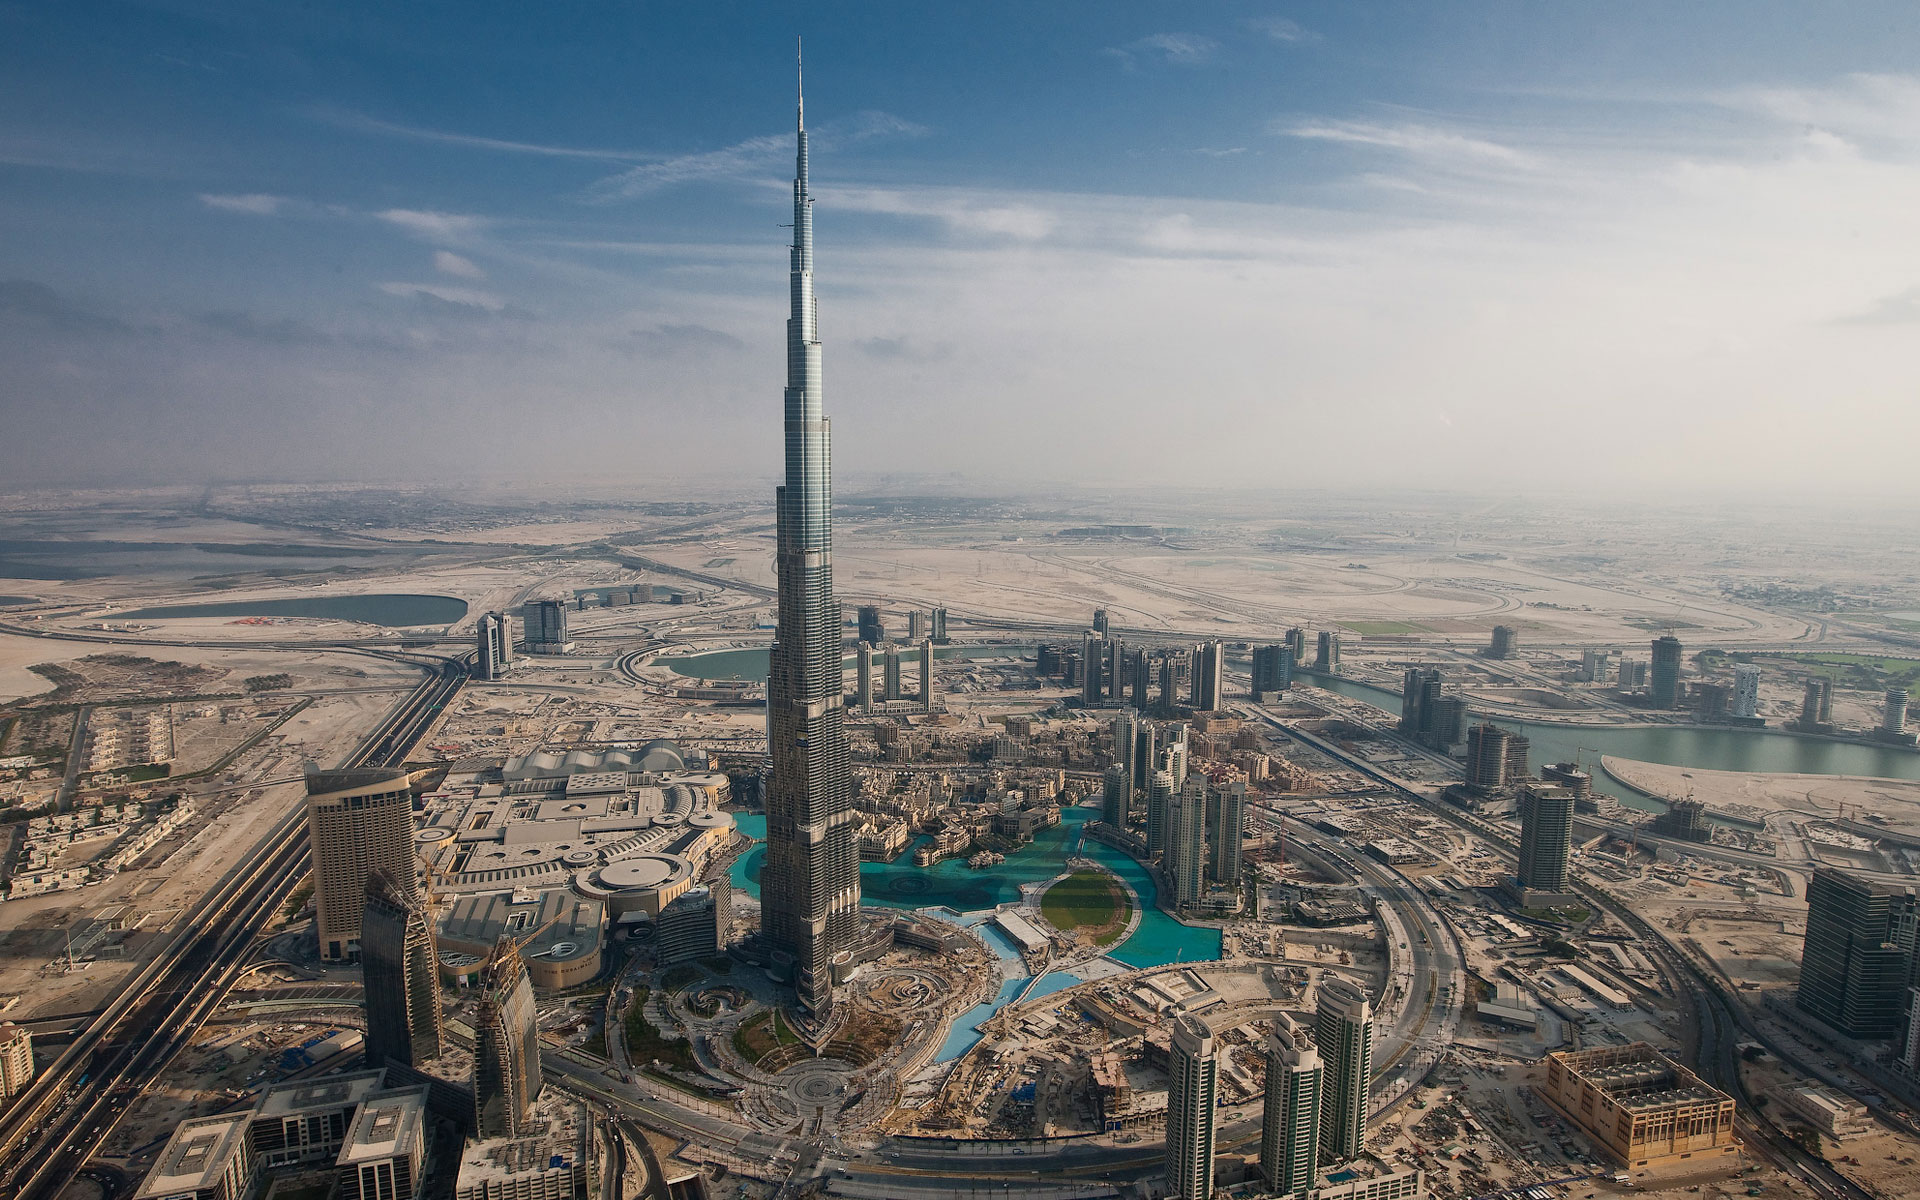 dubai s burj khalifa now has the highest observation deck in the world at 555 m. Black Bedroom Furniture Sets. Home Design Ideas